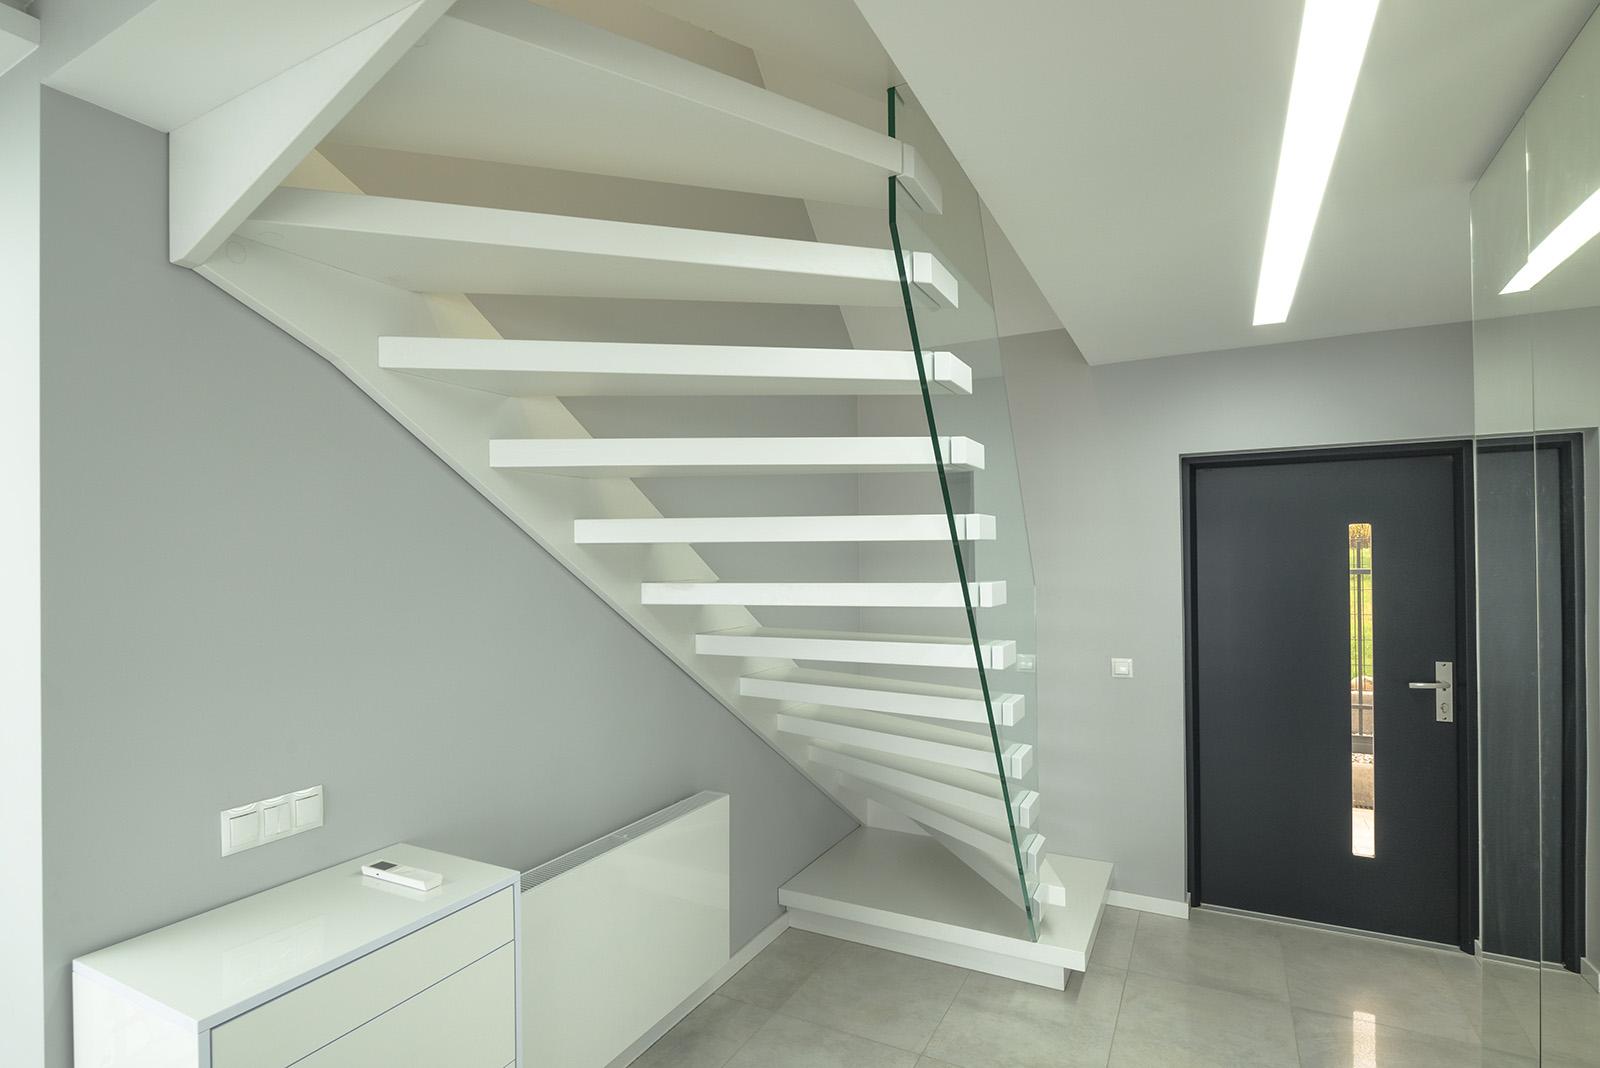 holztreppen aus polen qualit t aus tradition. Black Bedroom Furniture Sets. Home Design Ideas